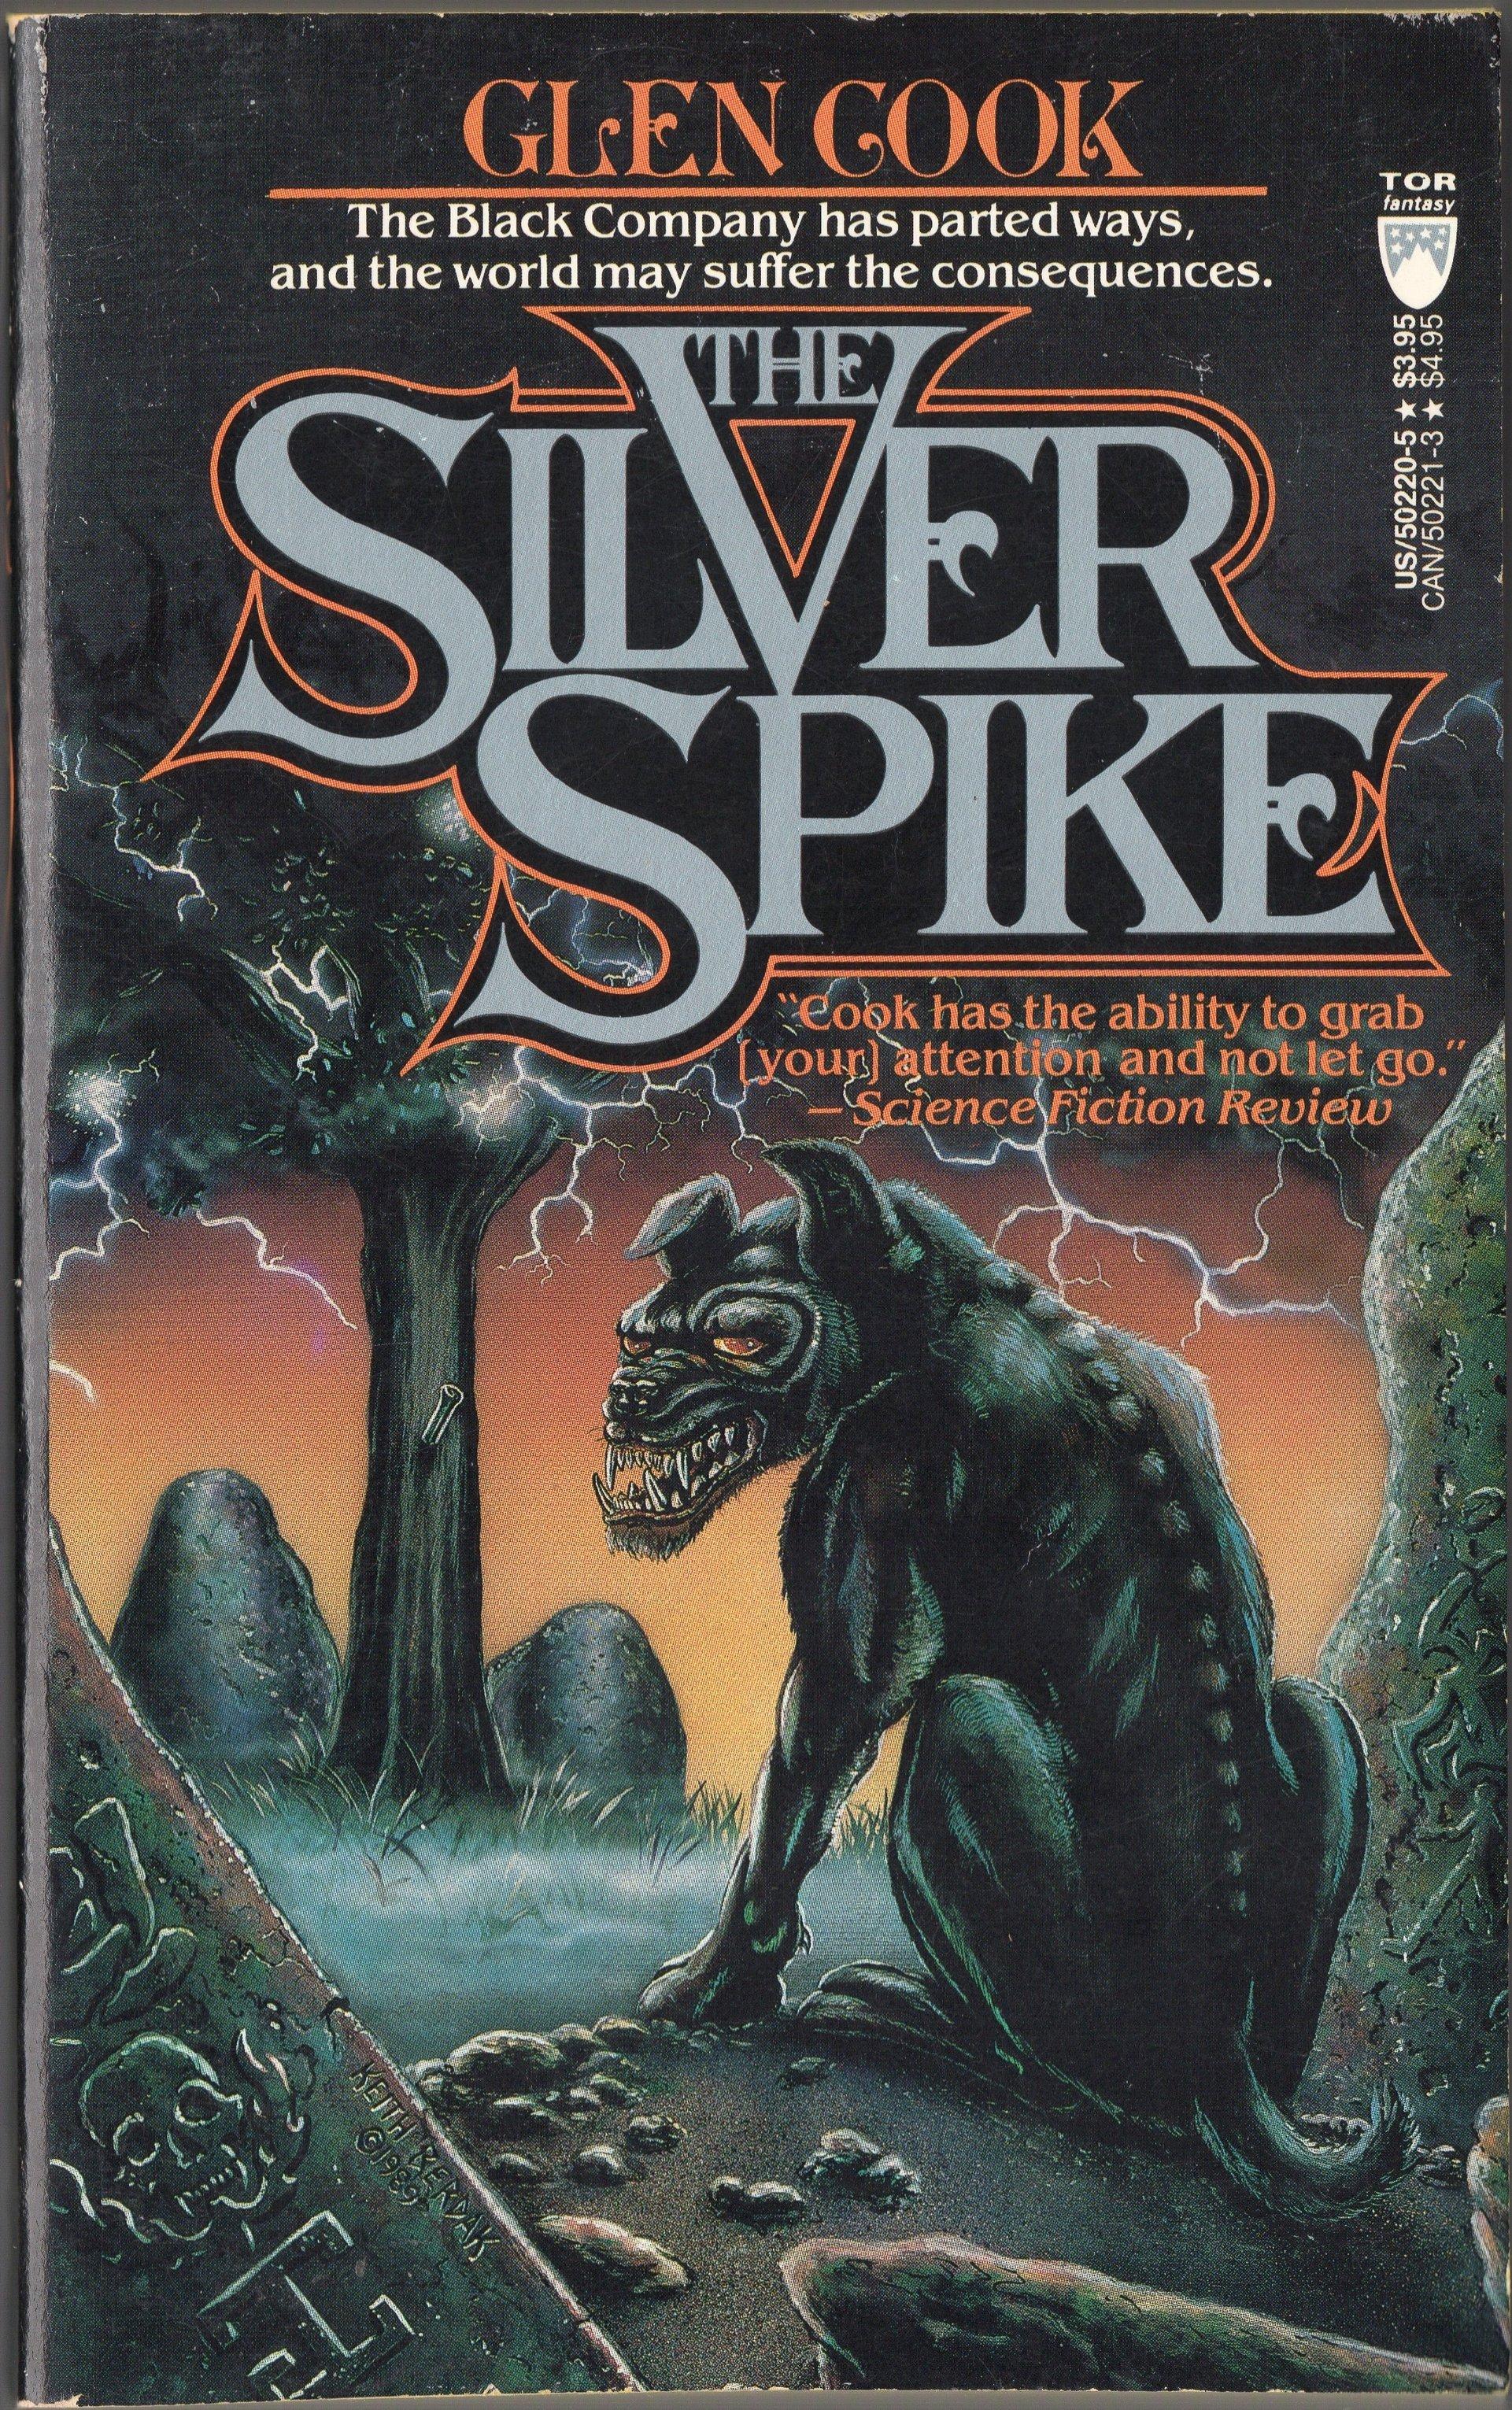 File:The Silver Spike.jpg